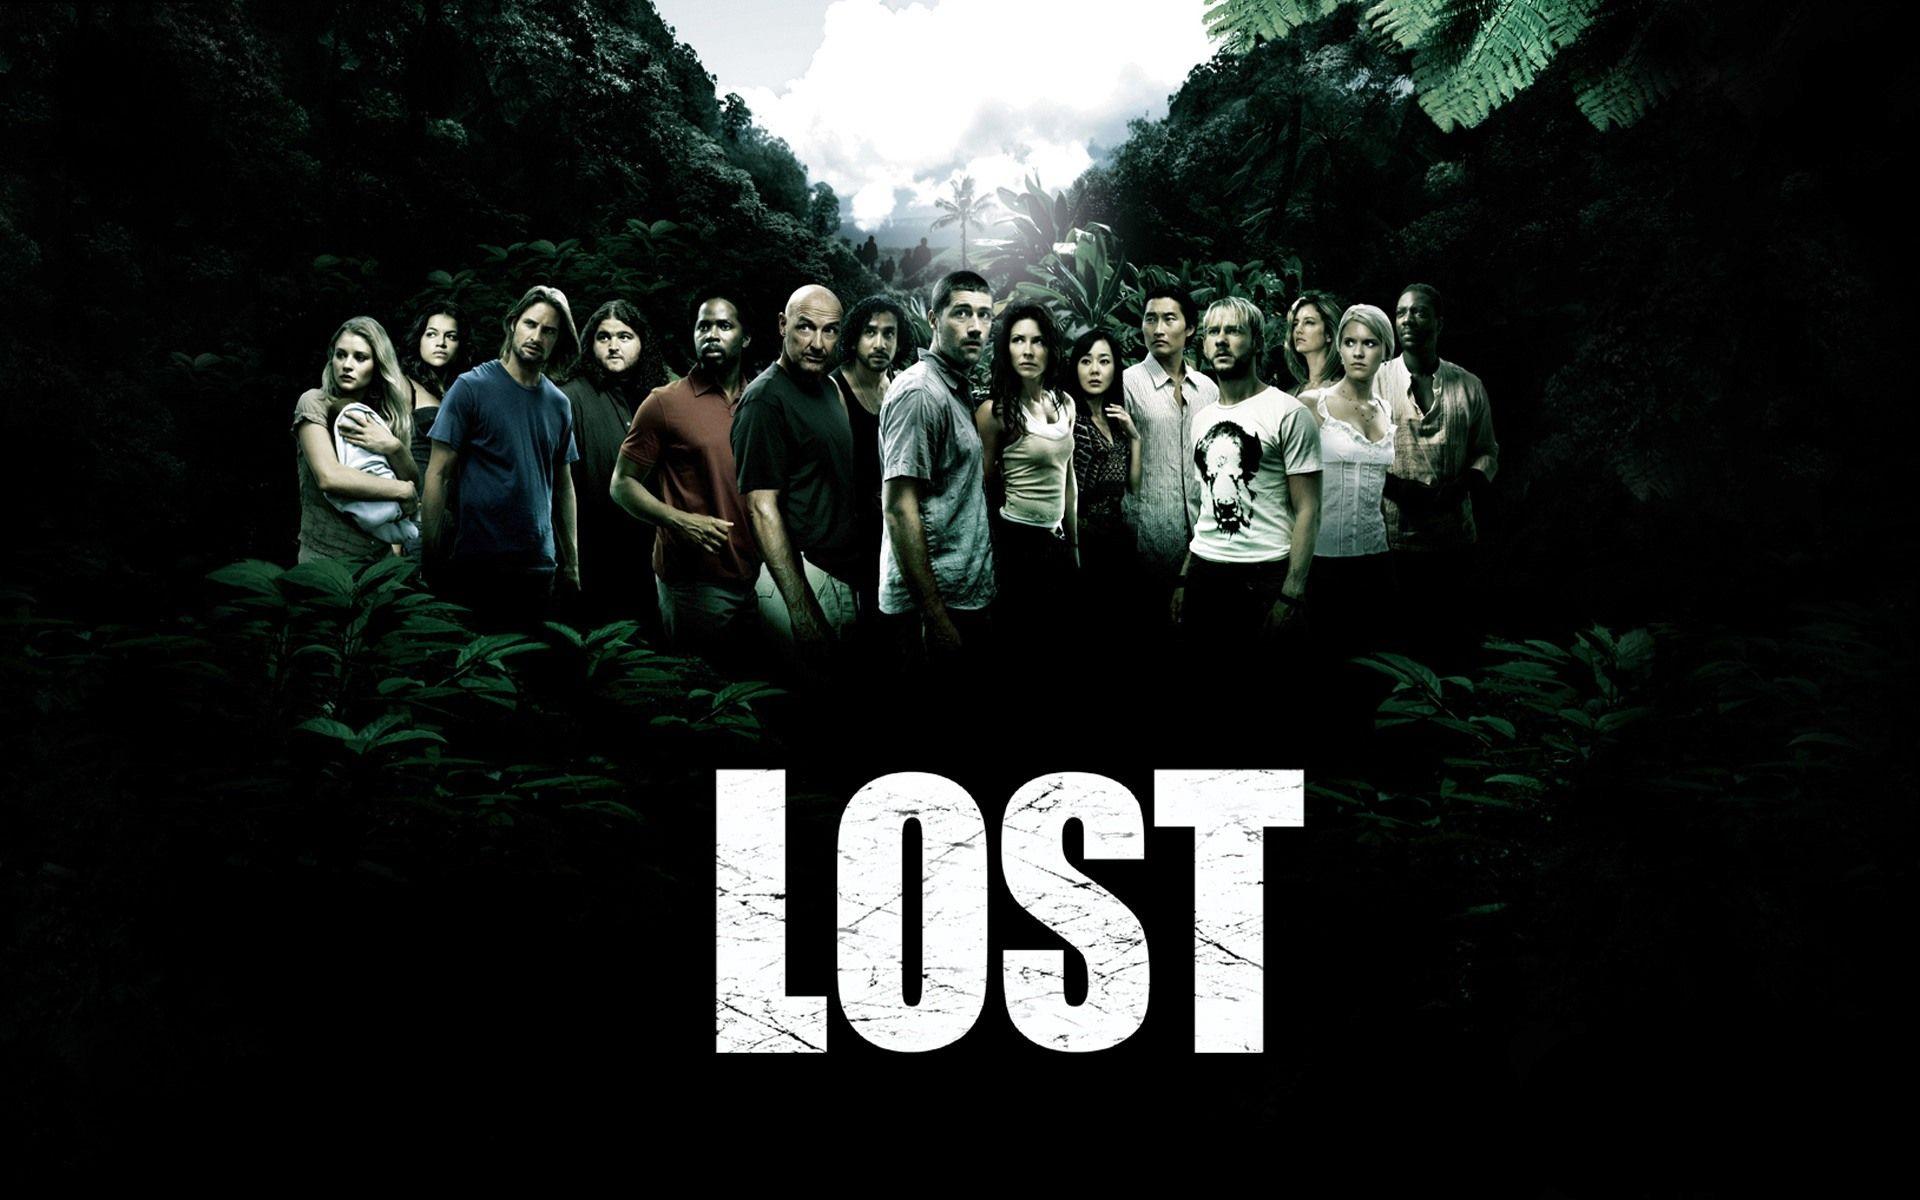 Lost TV Series Widescreen WallPaper HD